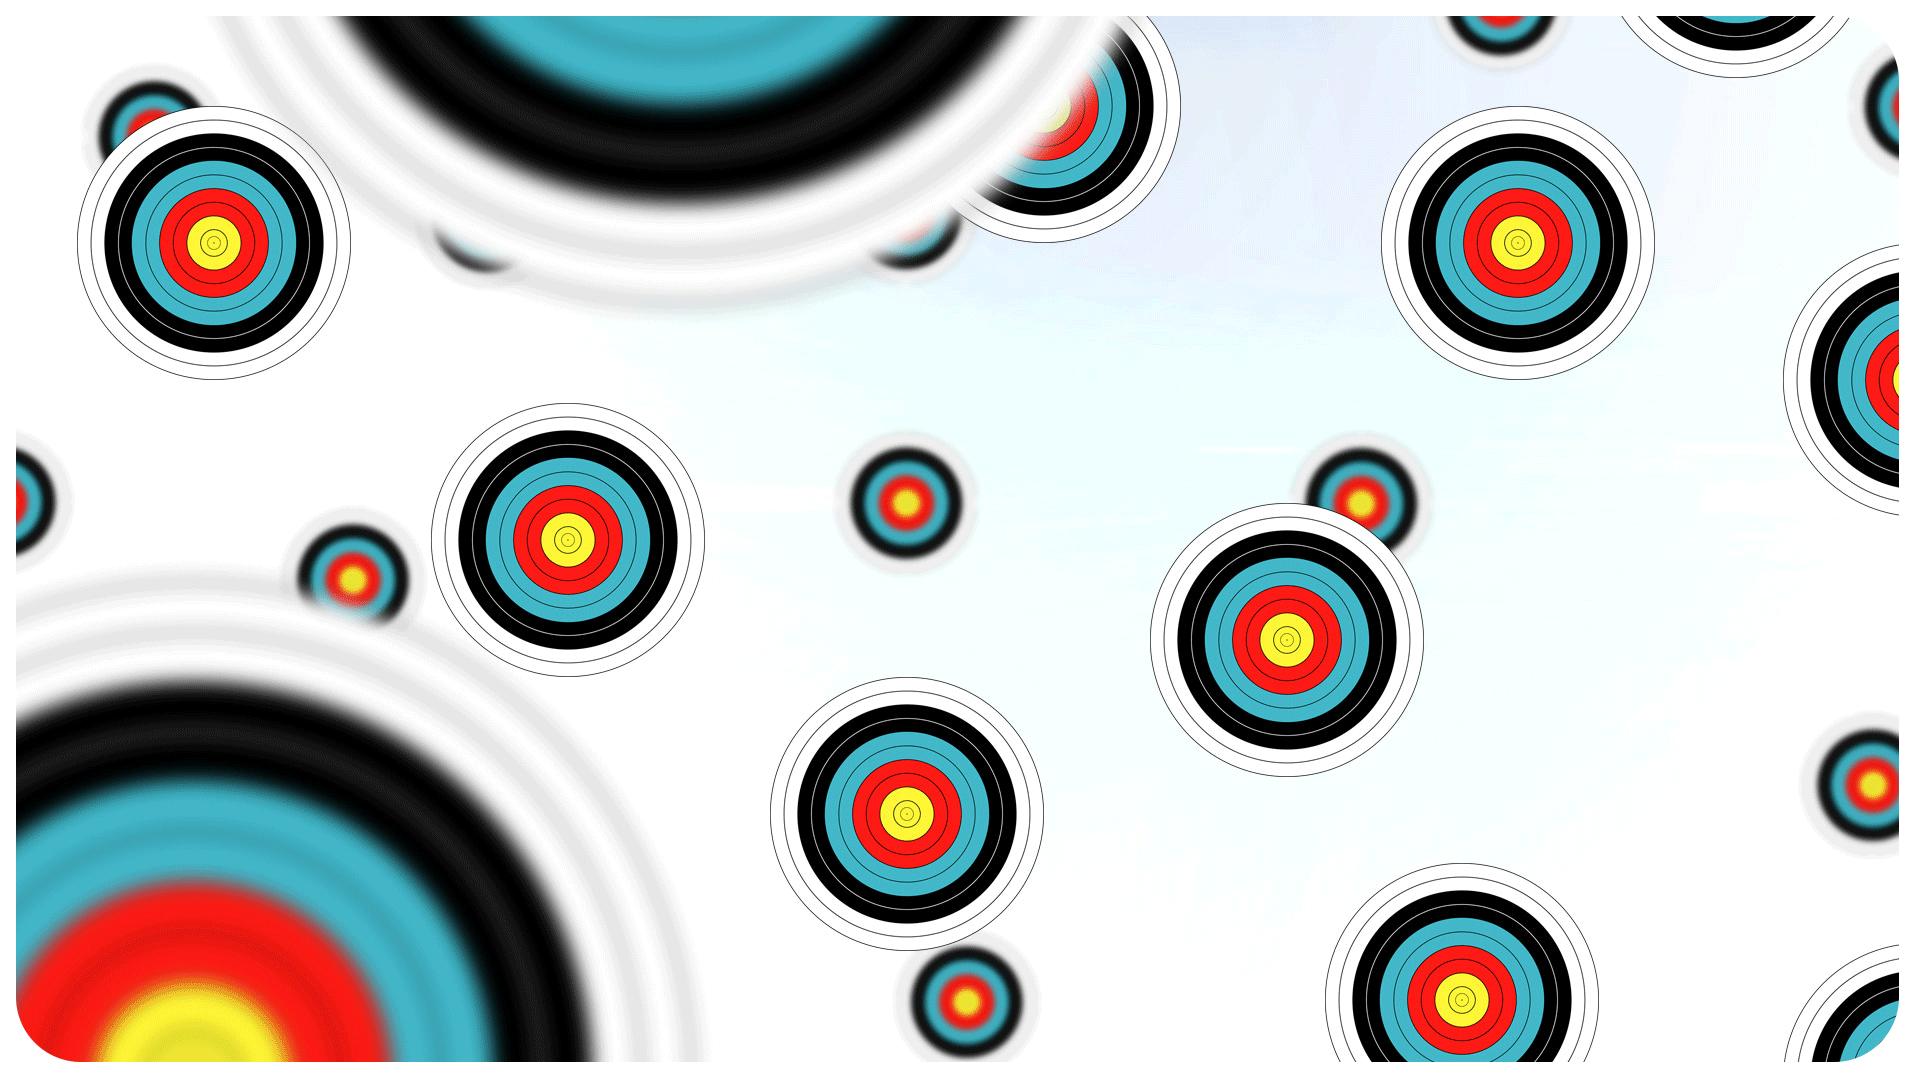 Open Shooting - Wanna' Play?